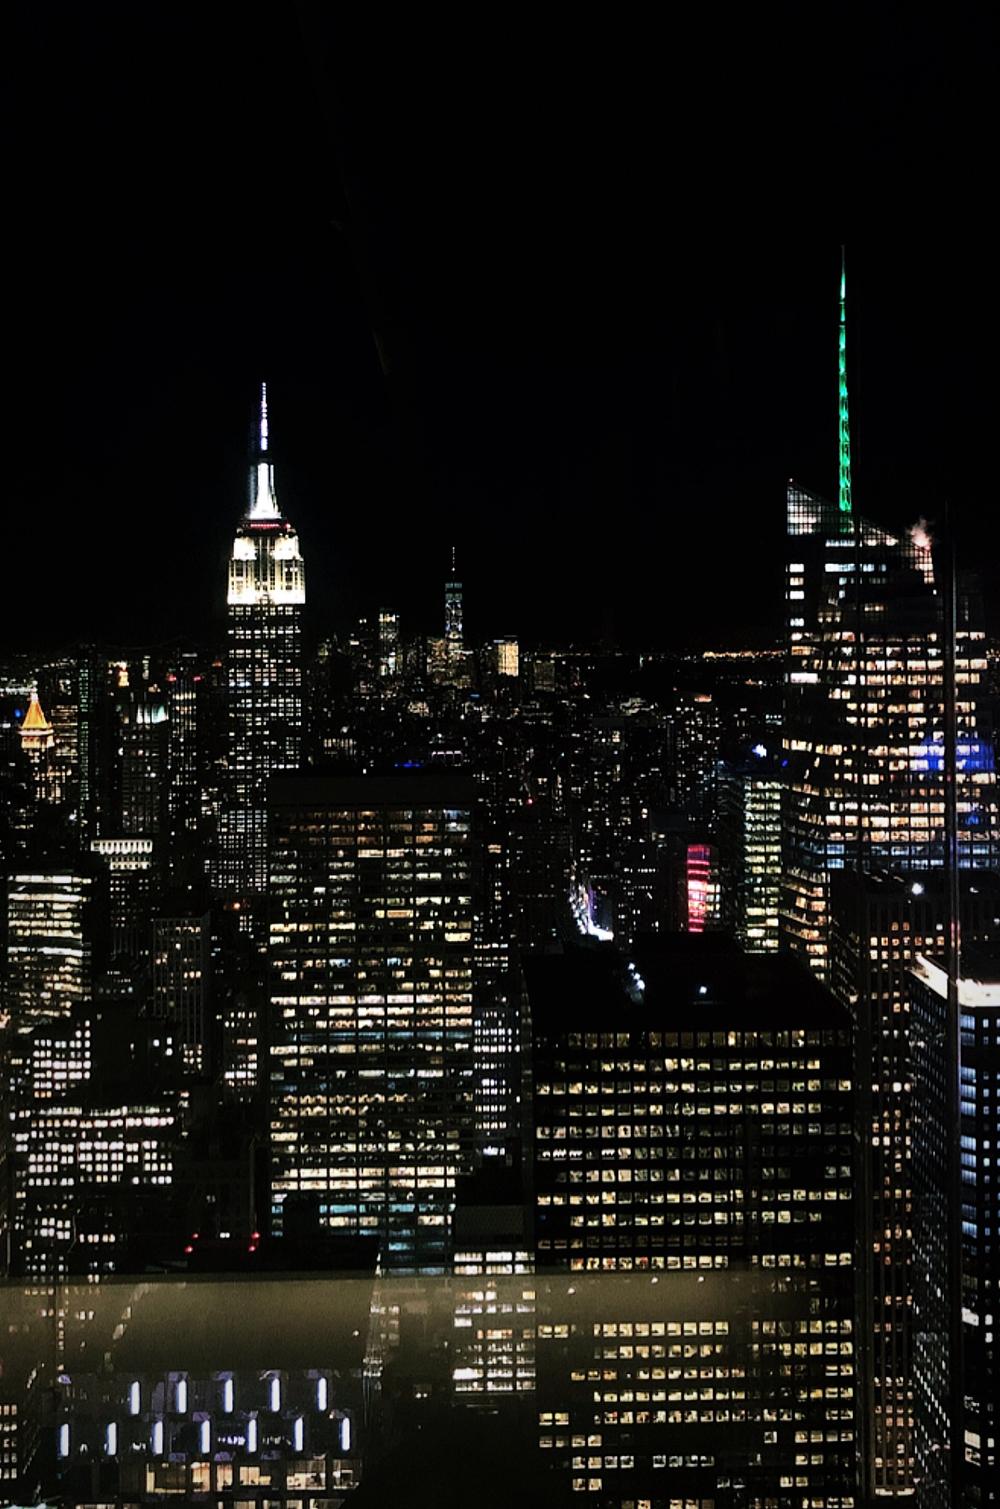 Virtual New York Fashion Week Has Begun I DreaminLace.com #NYFW